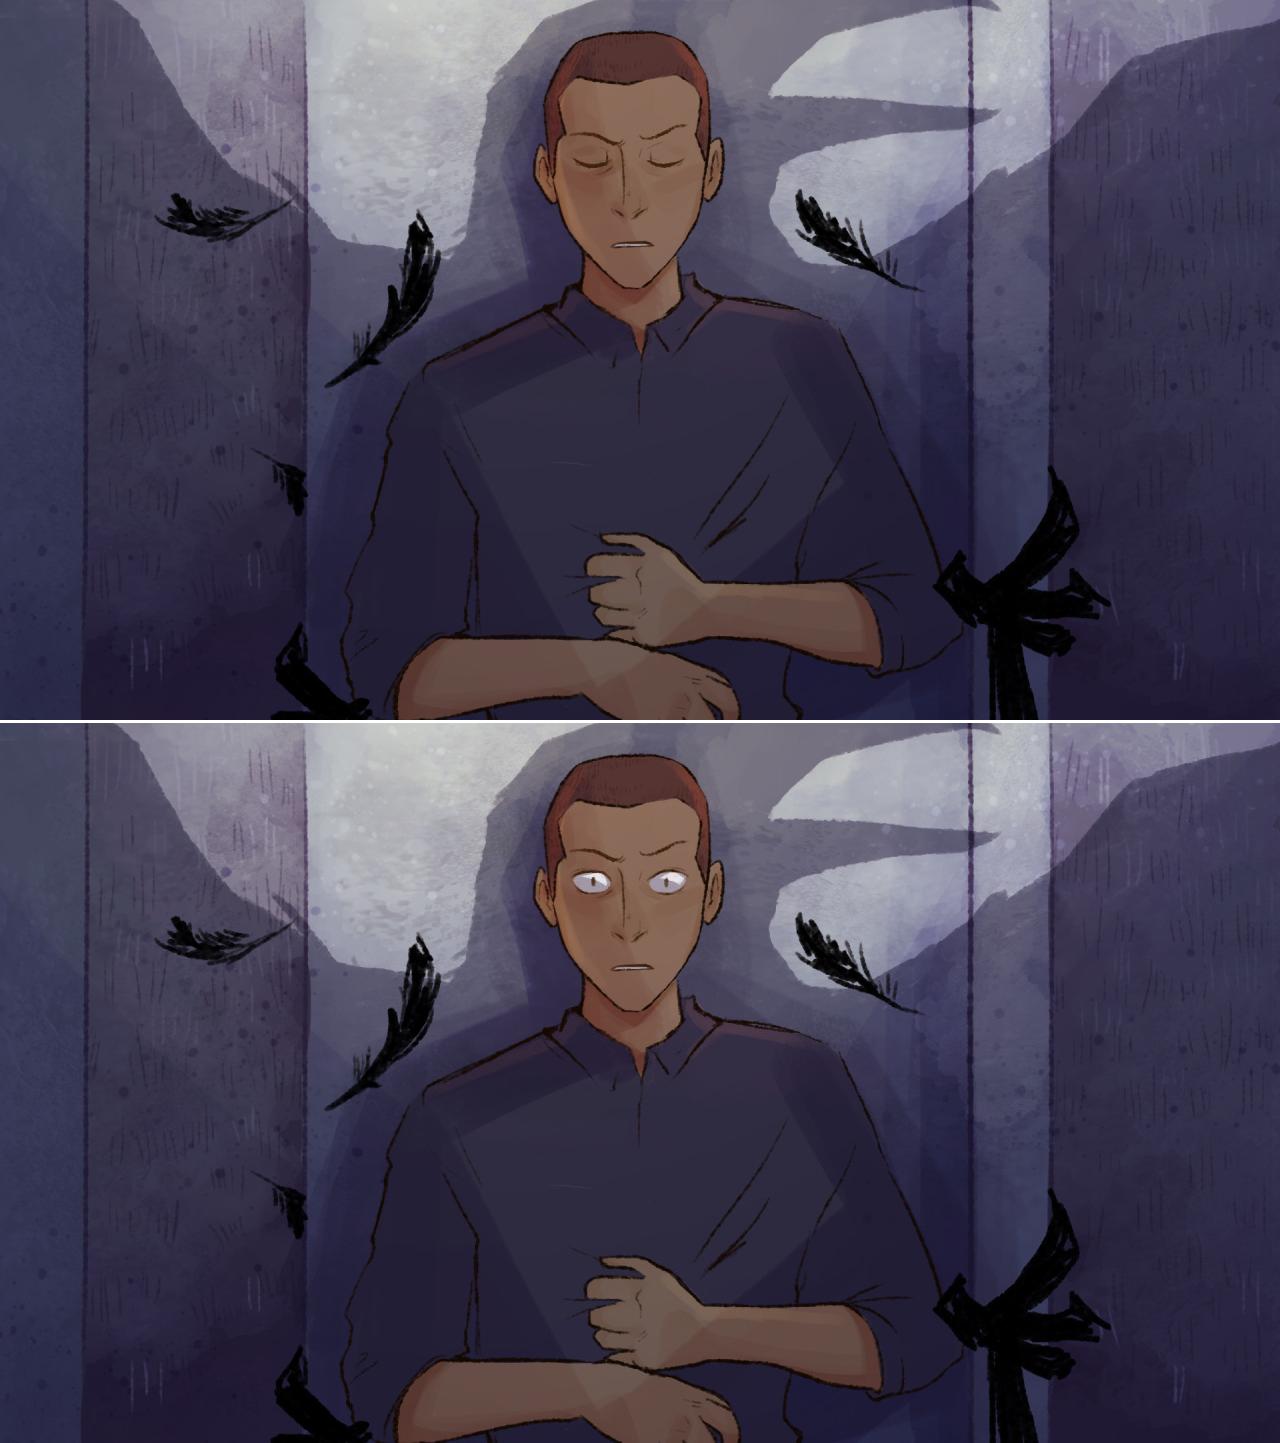 Pin By Ponder Bear On The Raven Cycle In 2020 Raven Art Raven Raven King